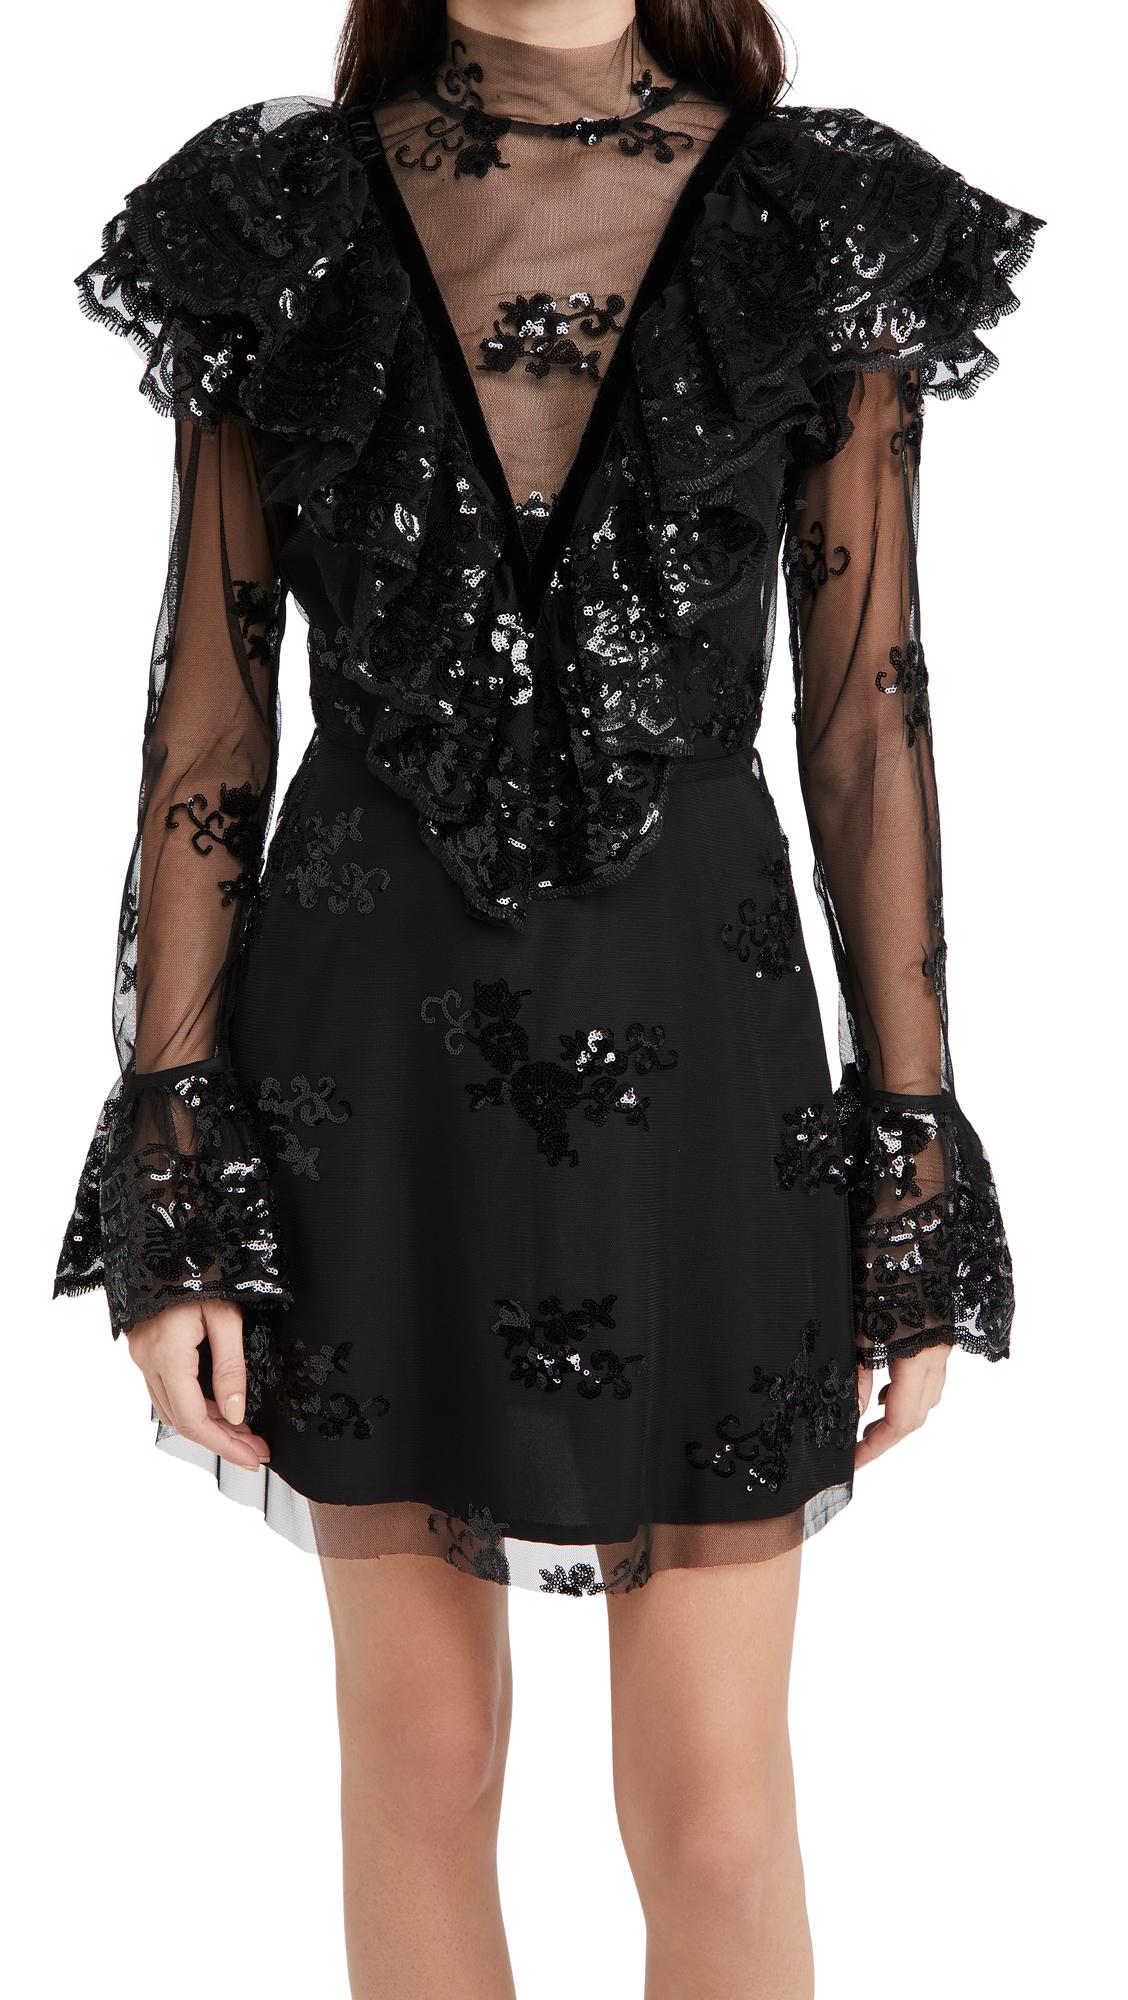 macgraw Friday Dress